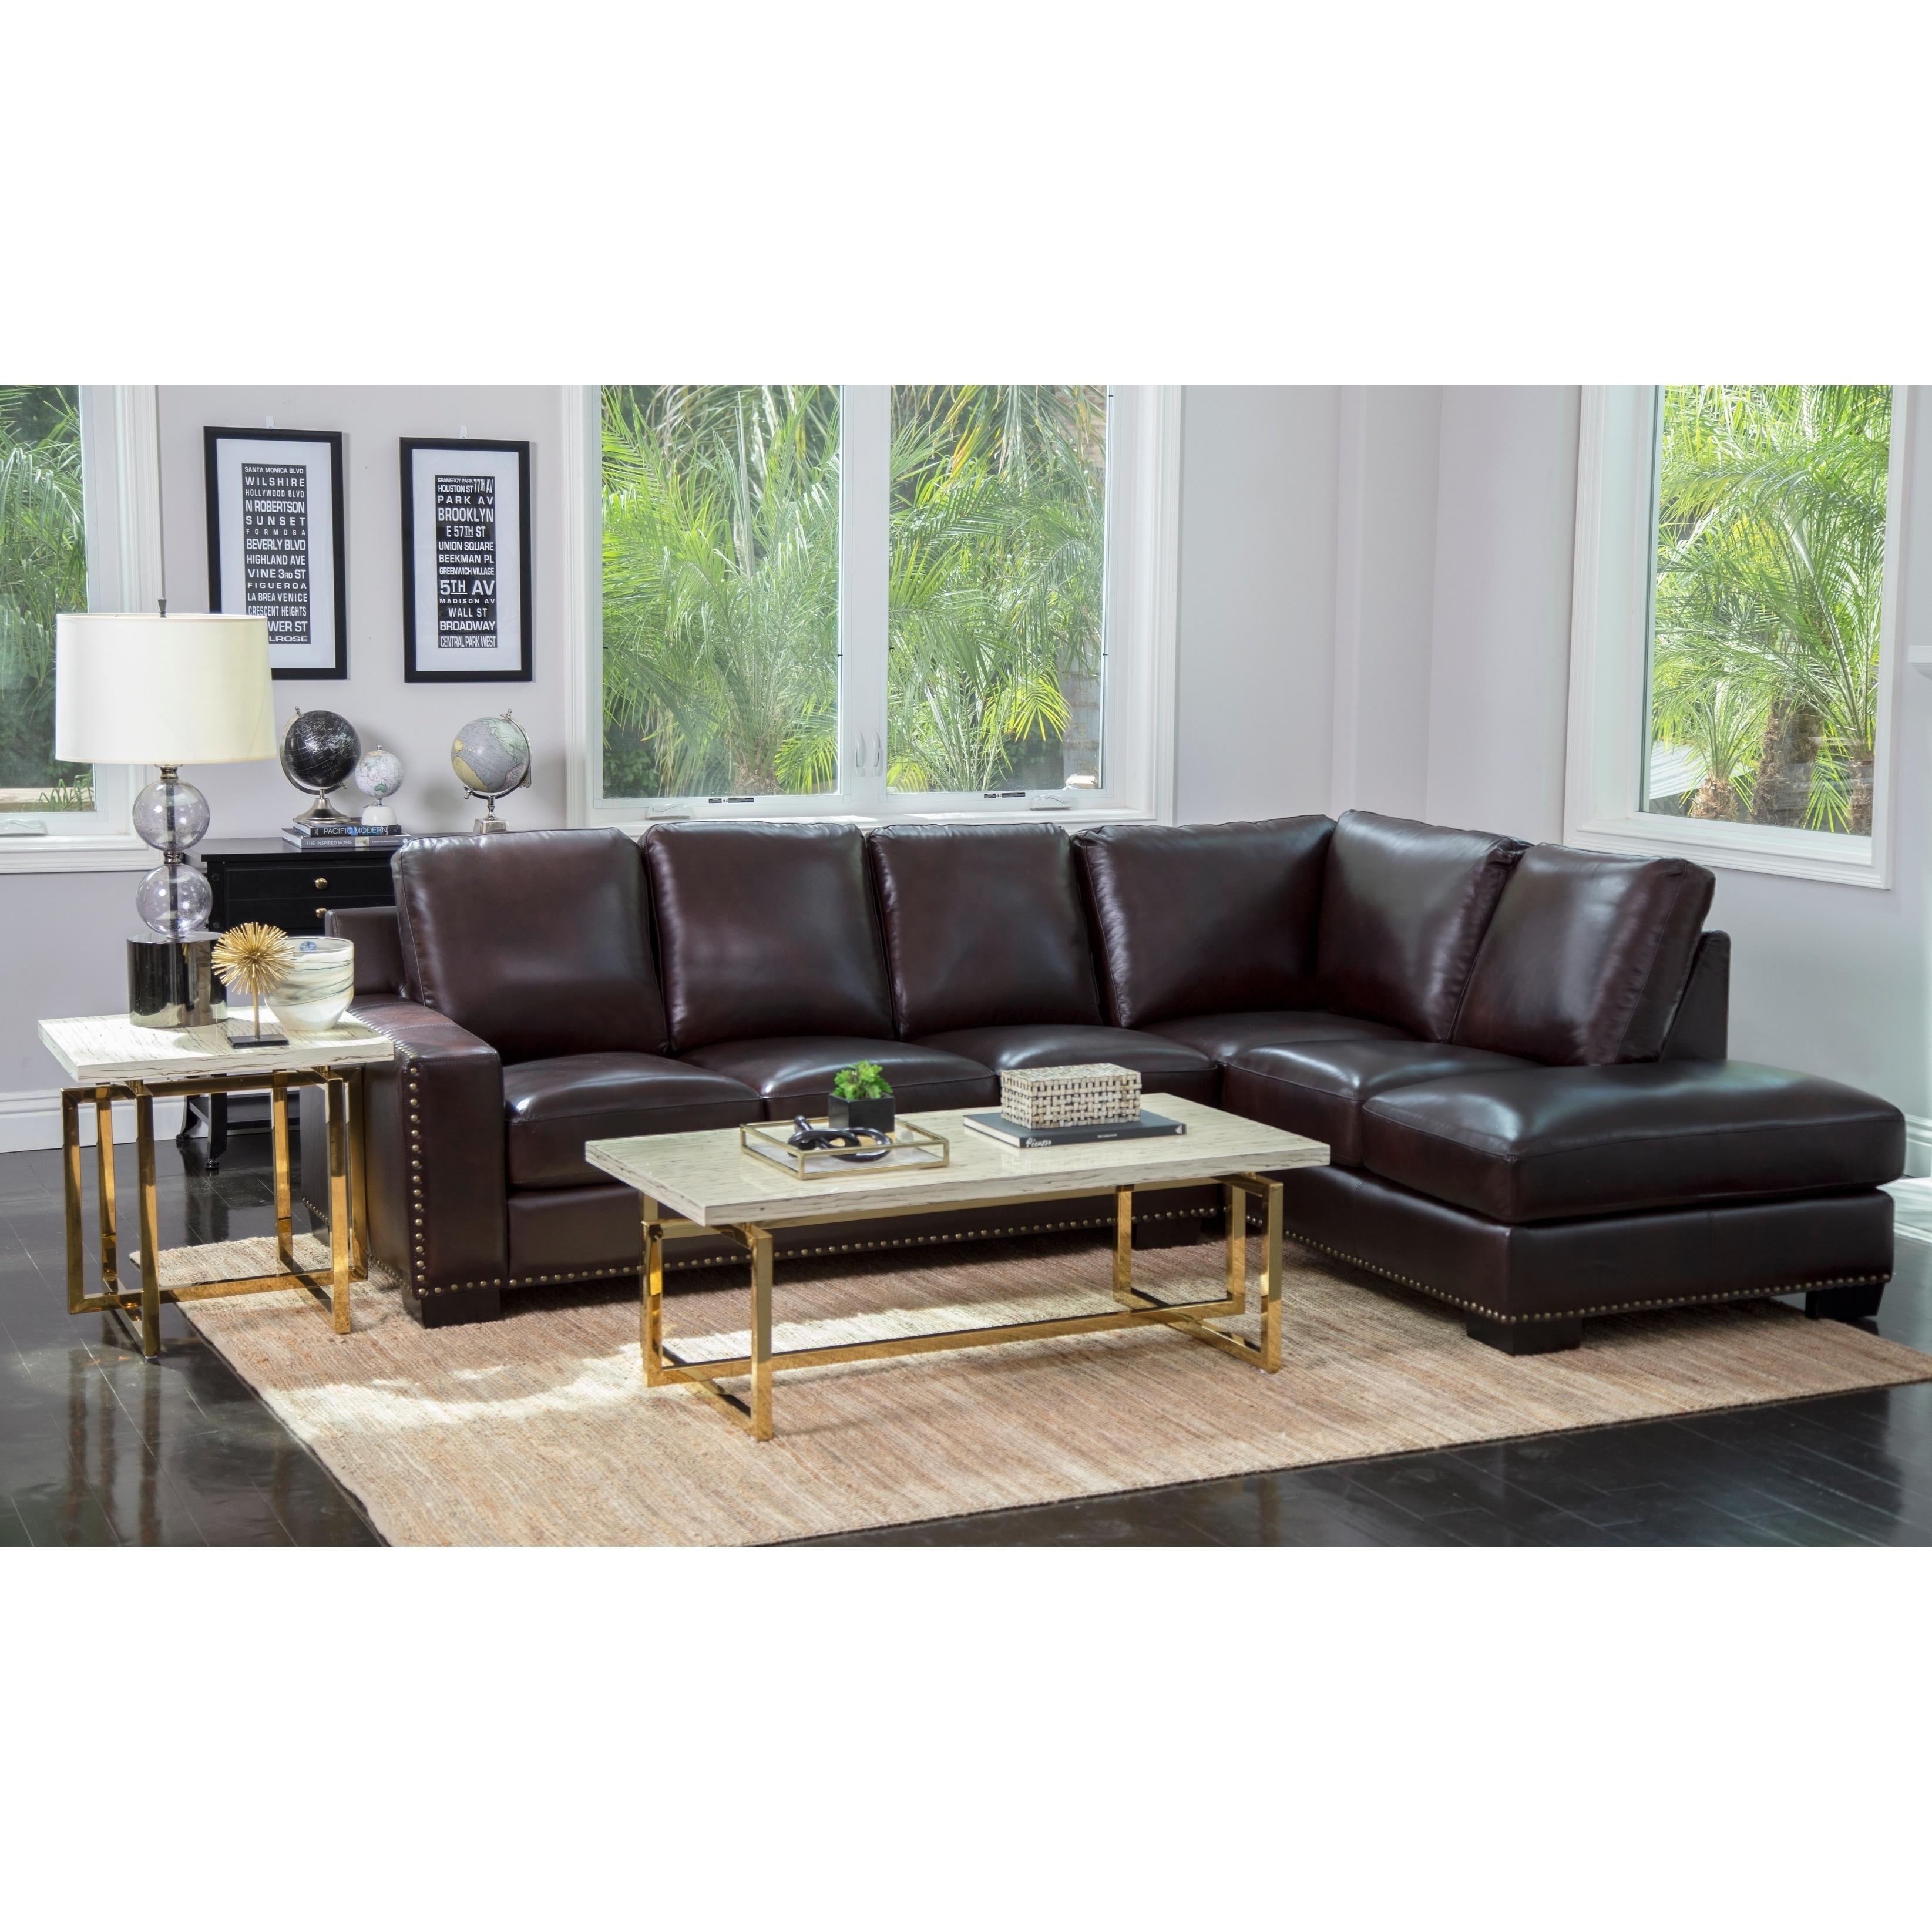 Bon Abbyson Monaco Brown Top Grain Leather Sectional Sofa